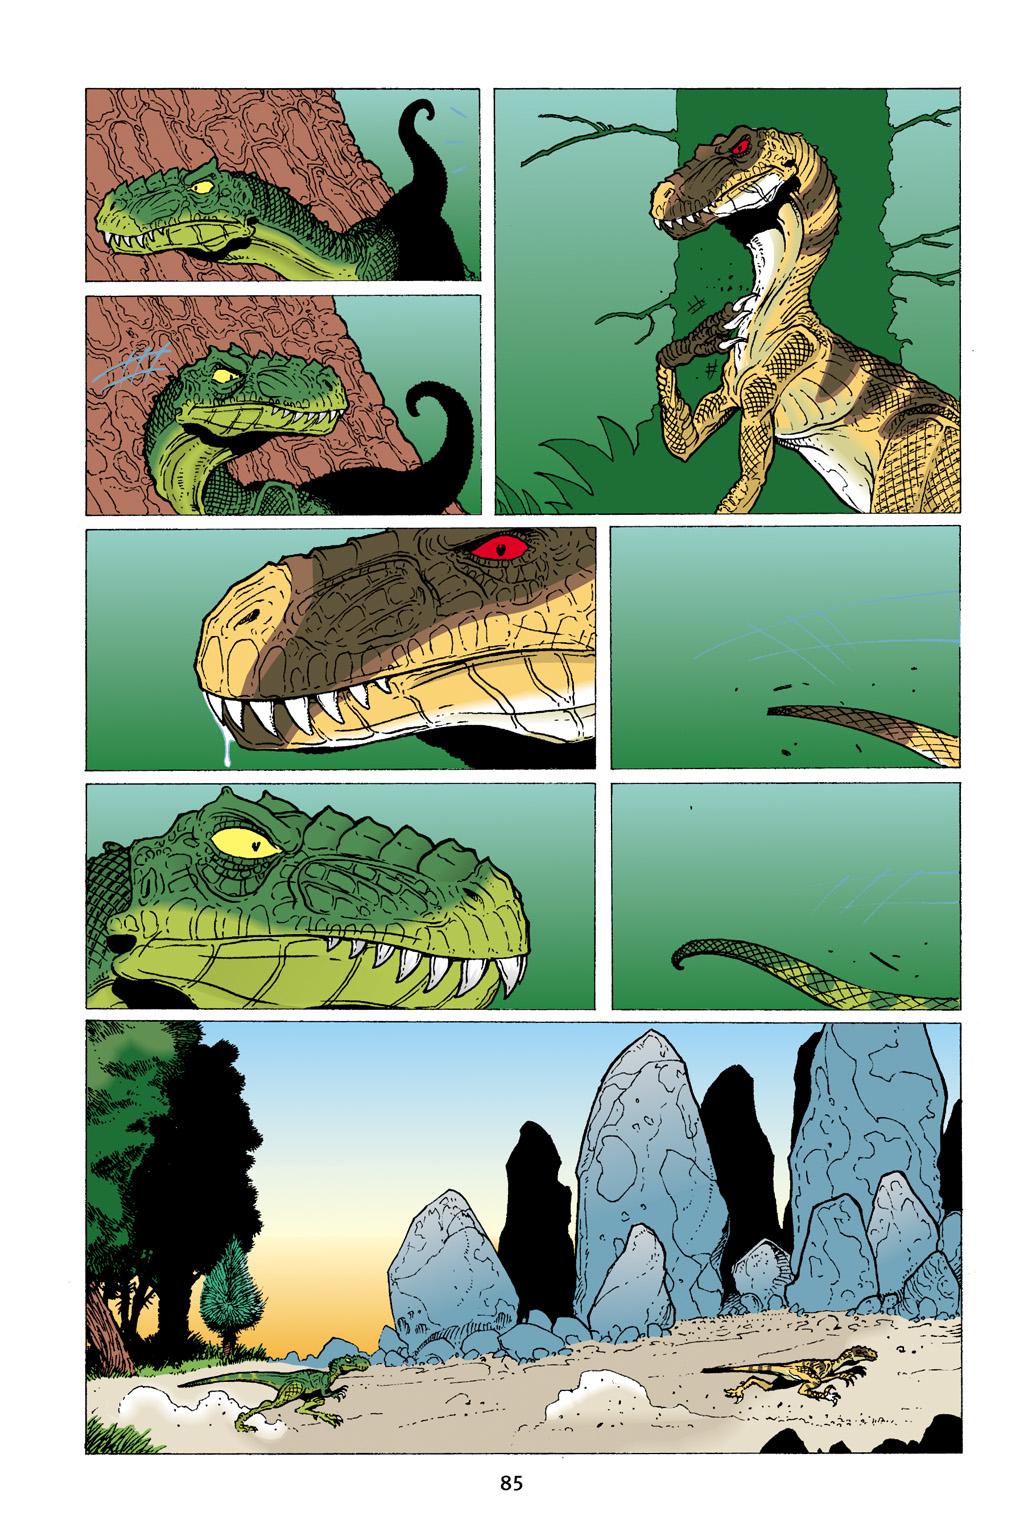 Age of Reptiles Omnibus Chap 3 - Next Chap 4